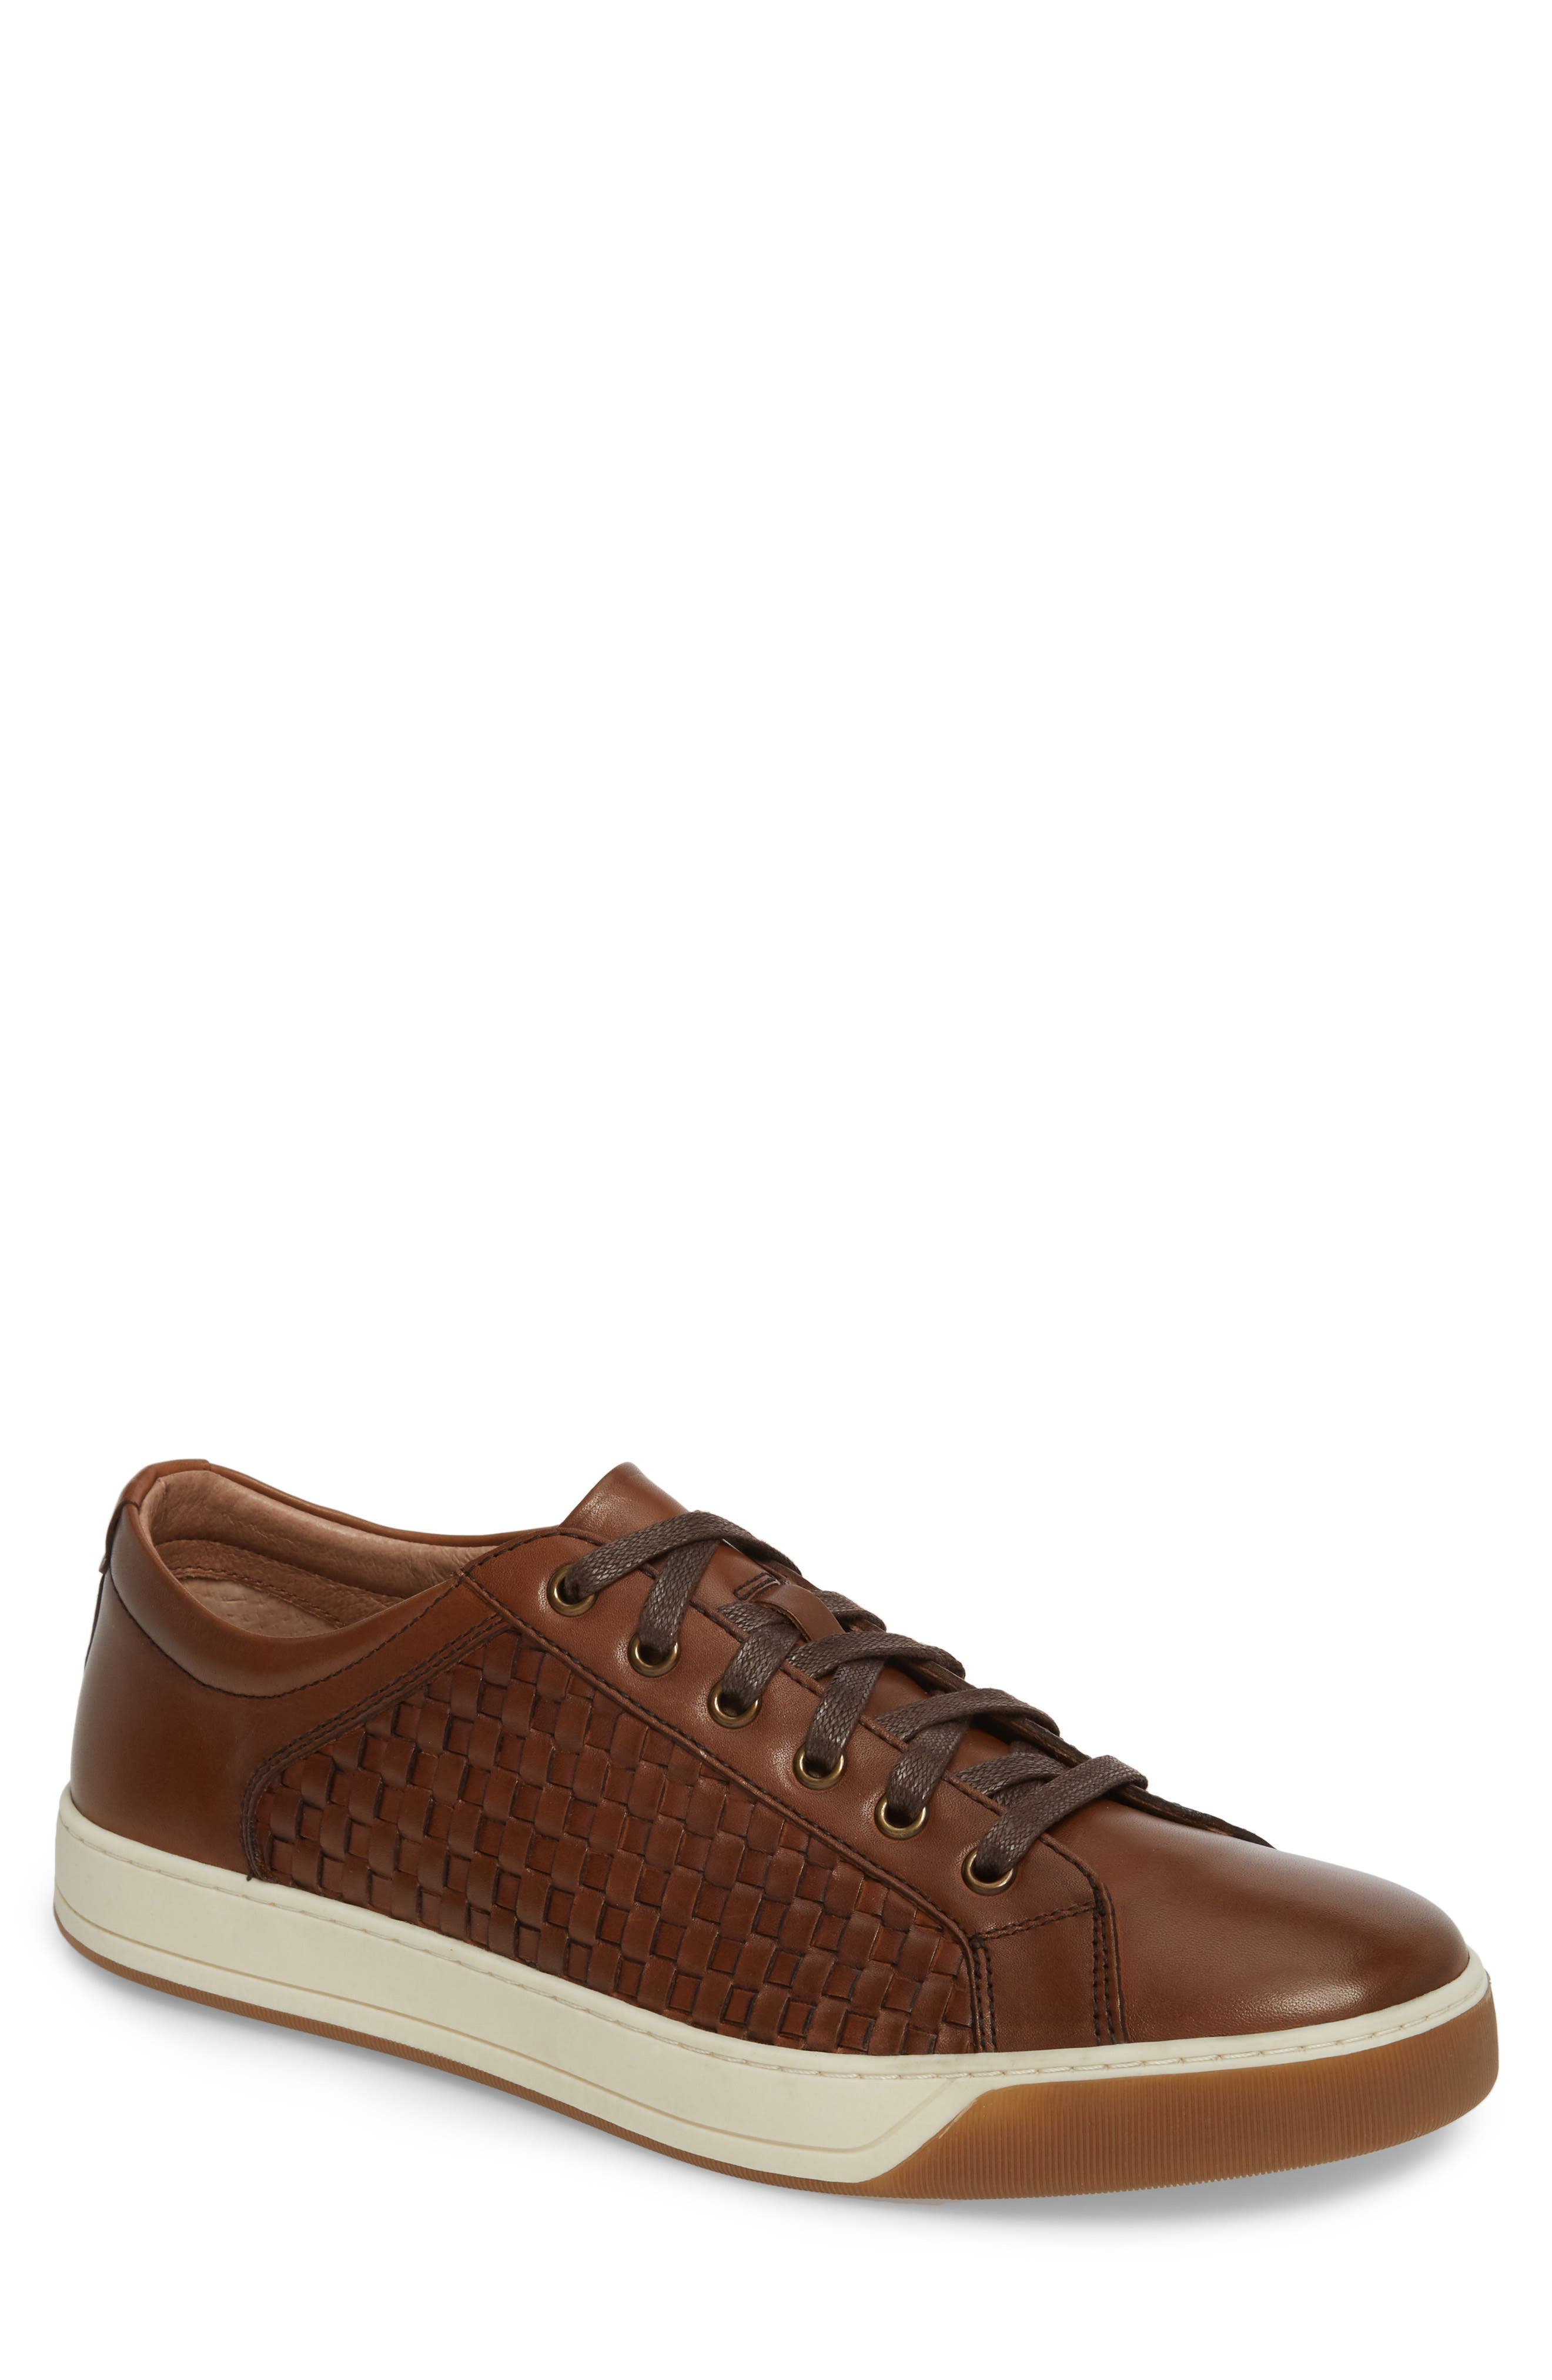 Main Image - J&M 1850 Allister Woven Low Top Sneaker (Men)